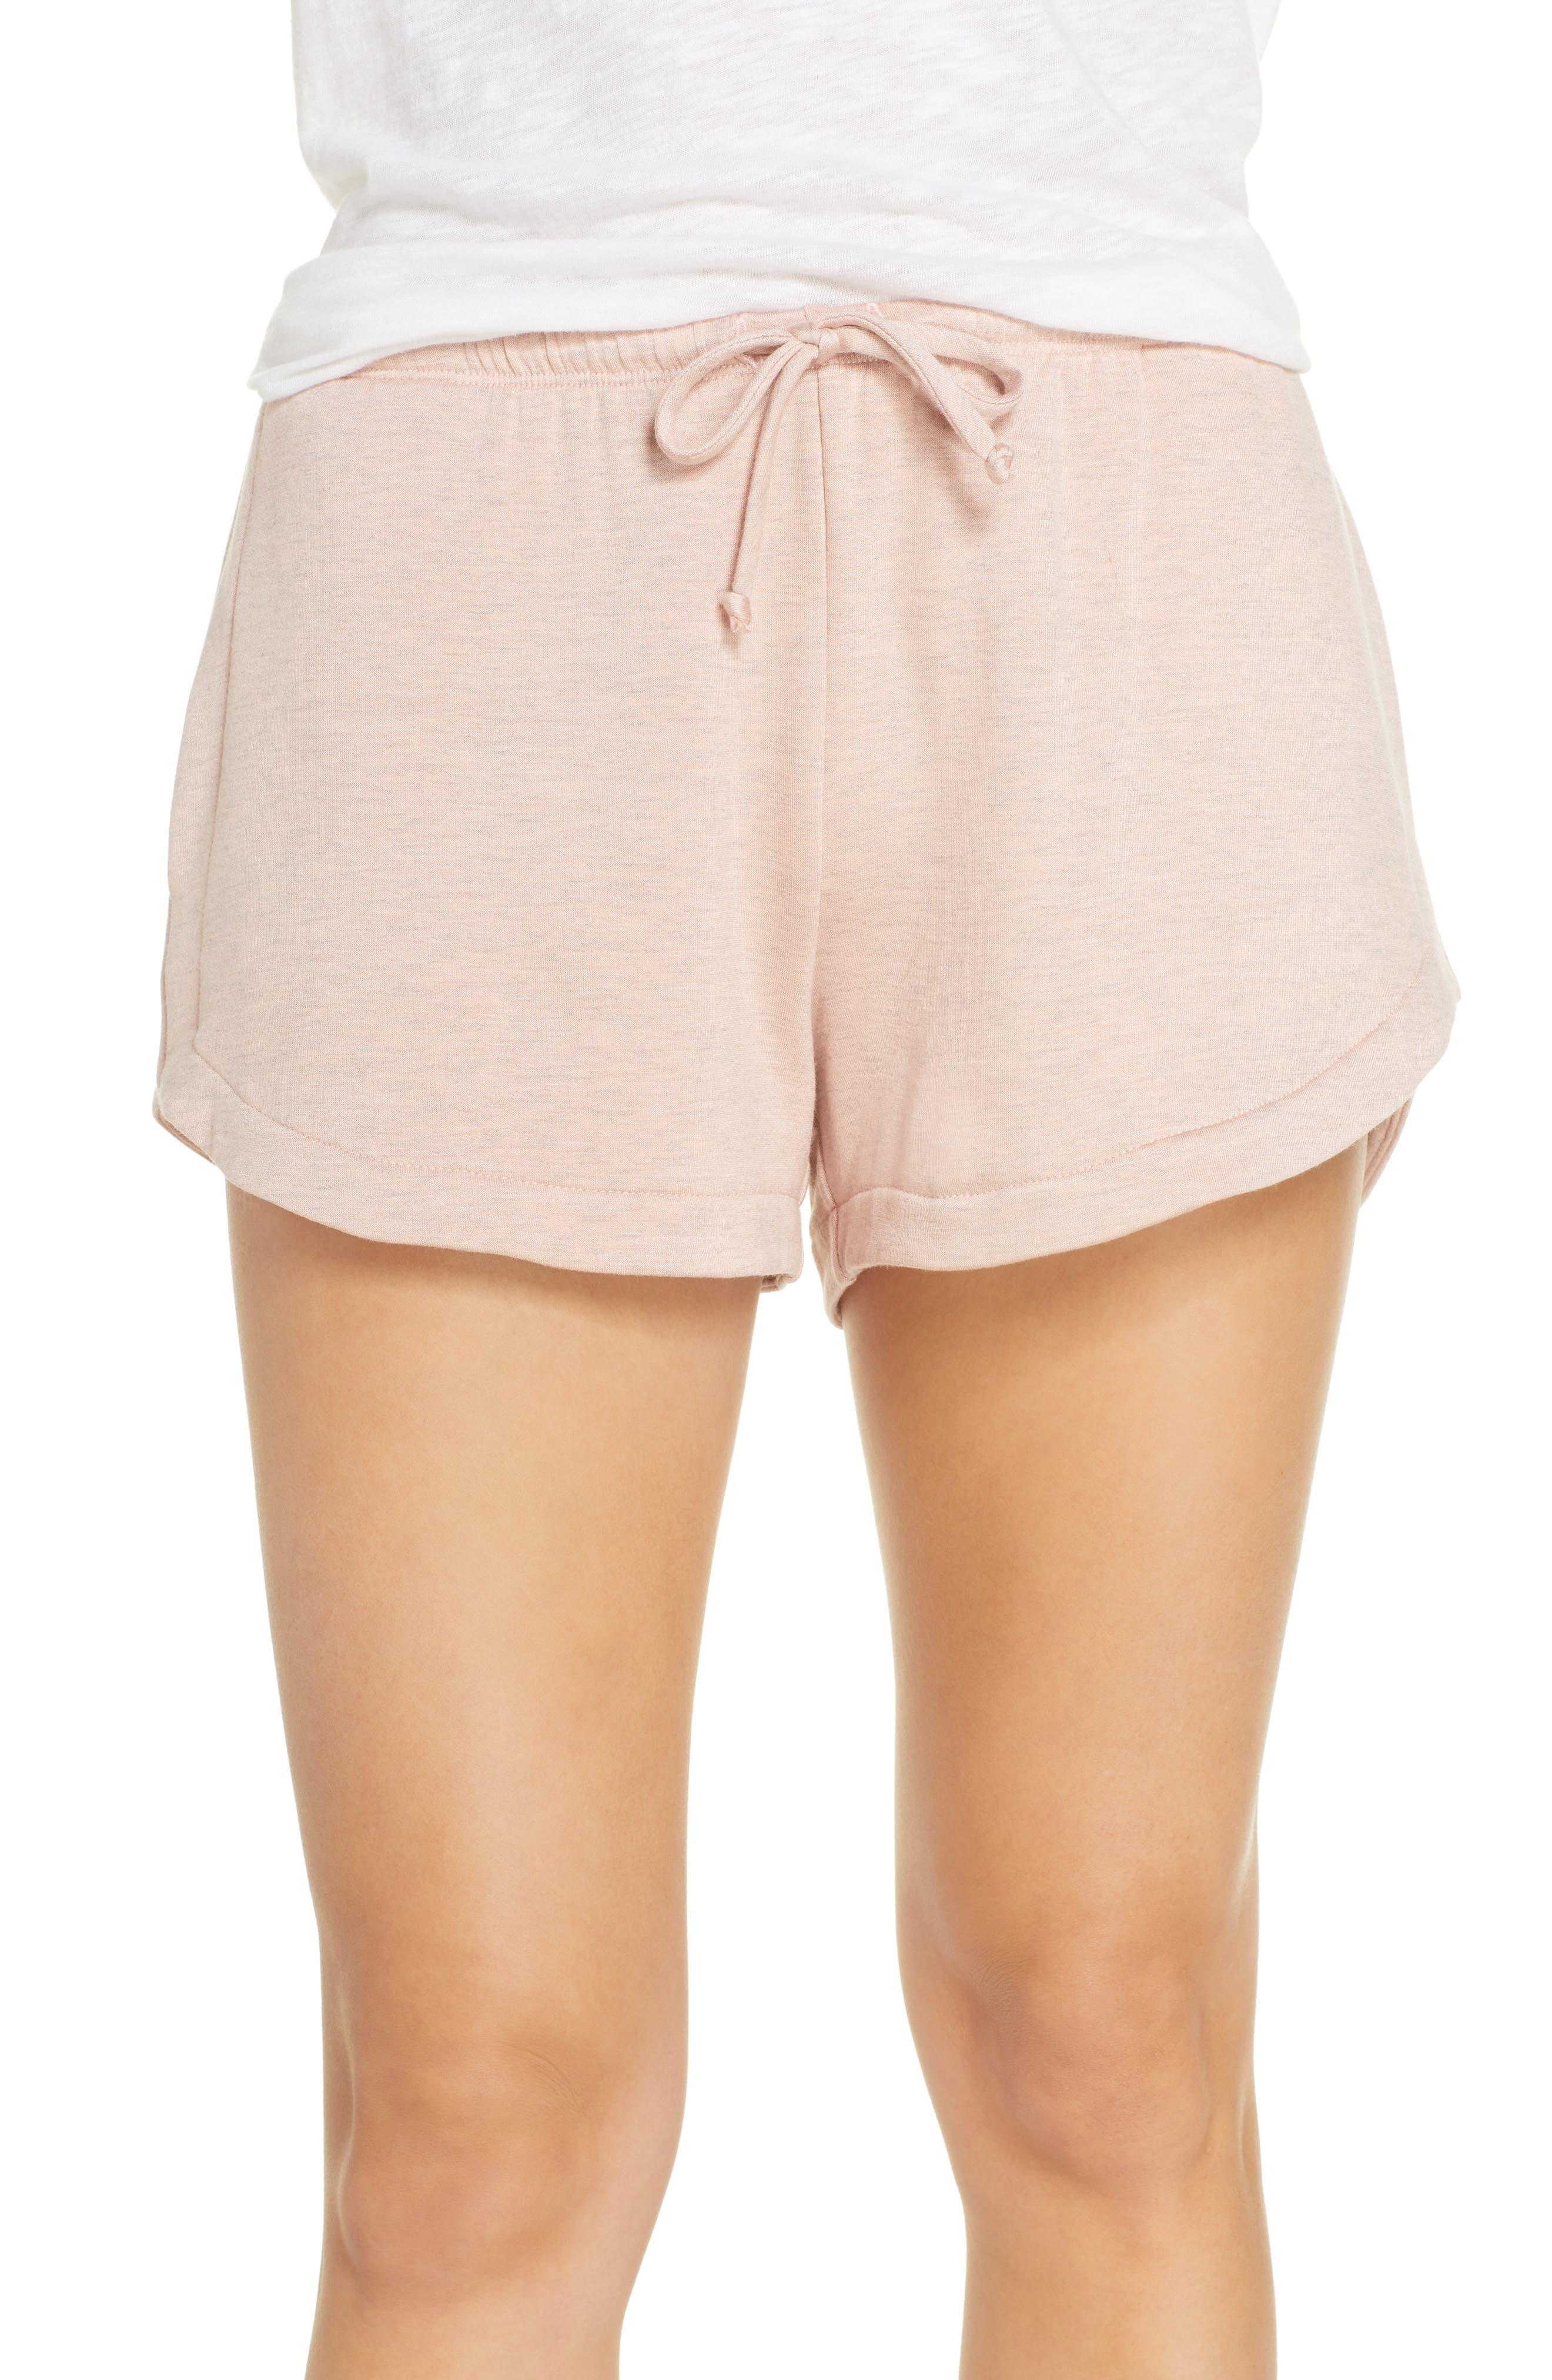 Socialite Pajama Shorts, Pink